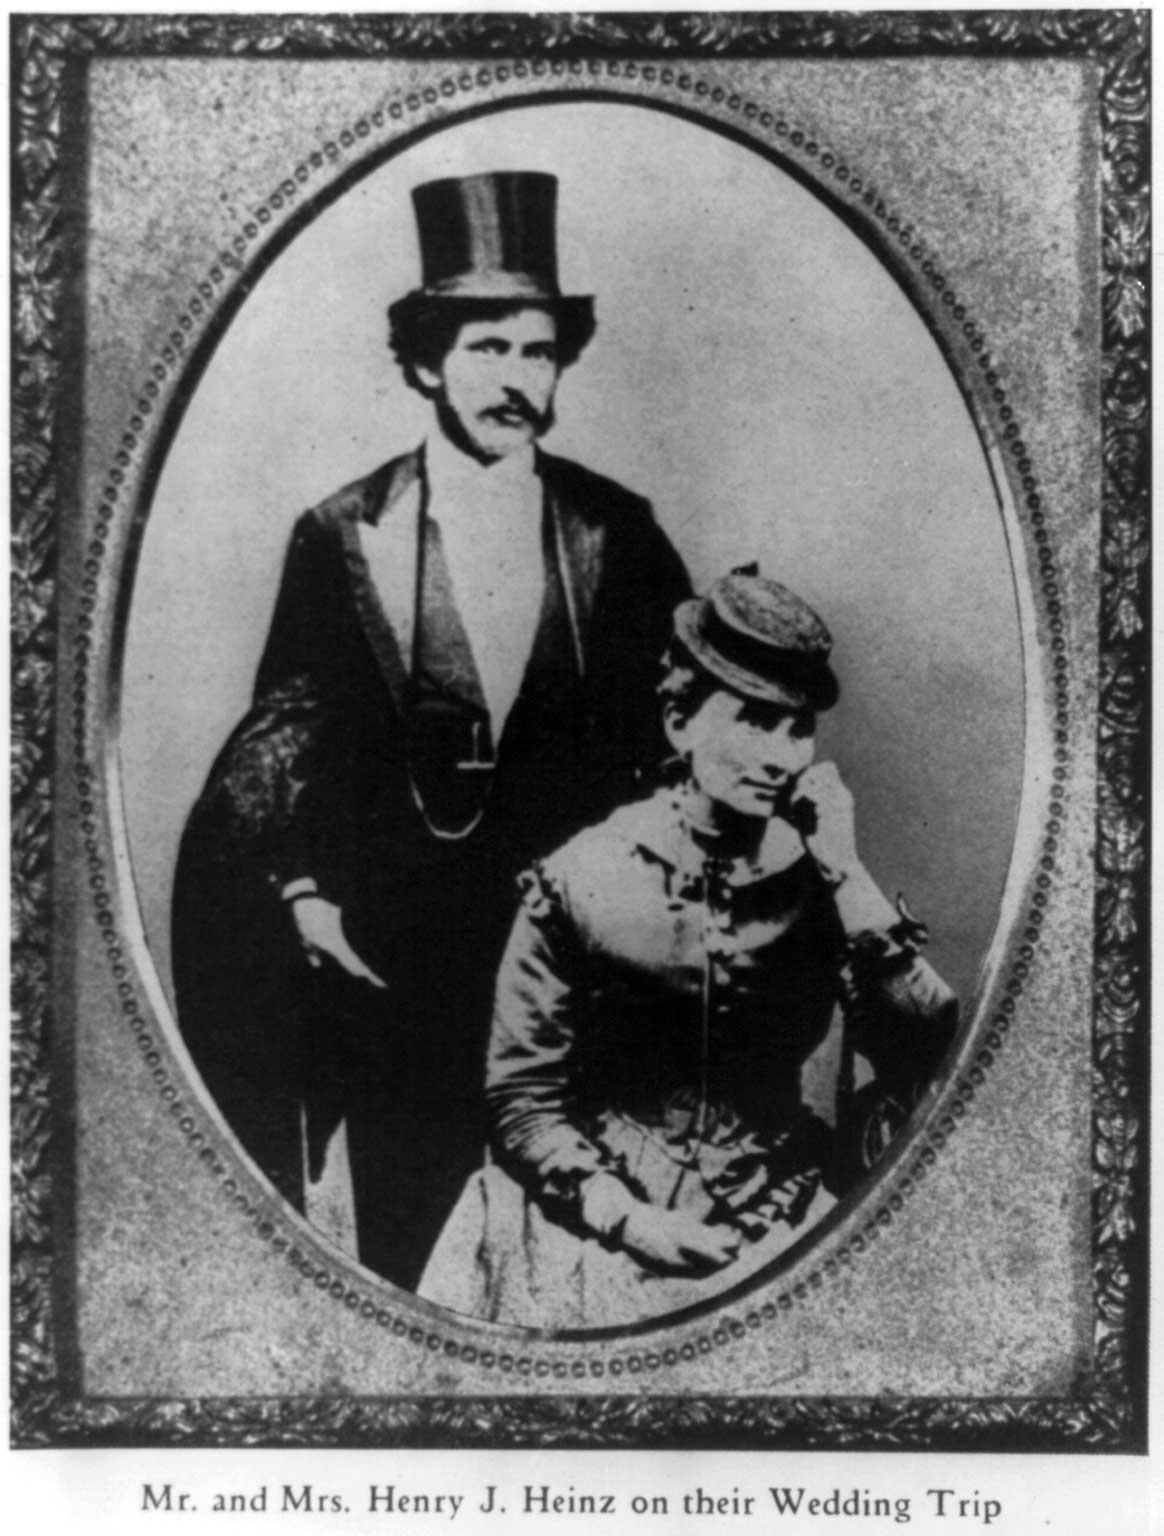 Henry J. and Sarah Heinz on their wedding trip. 1869